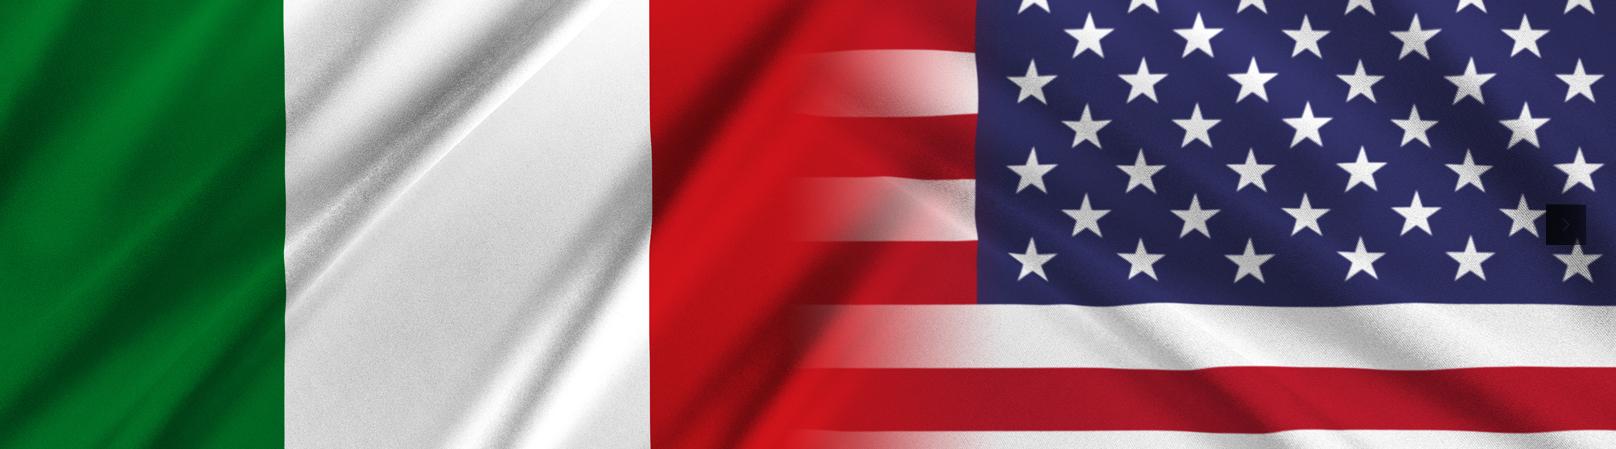 TRA ITALIA E U.S.A. – Riforme, Tutela, Sviluppo